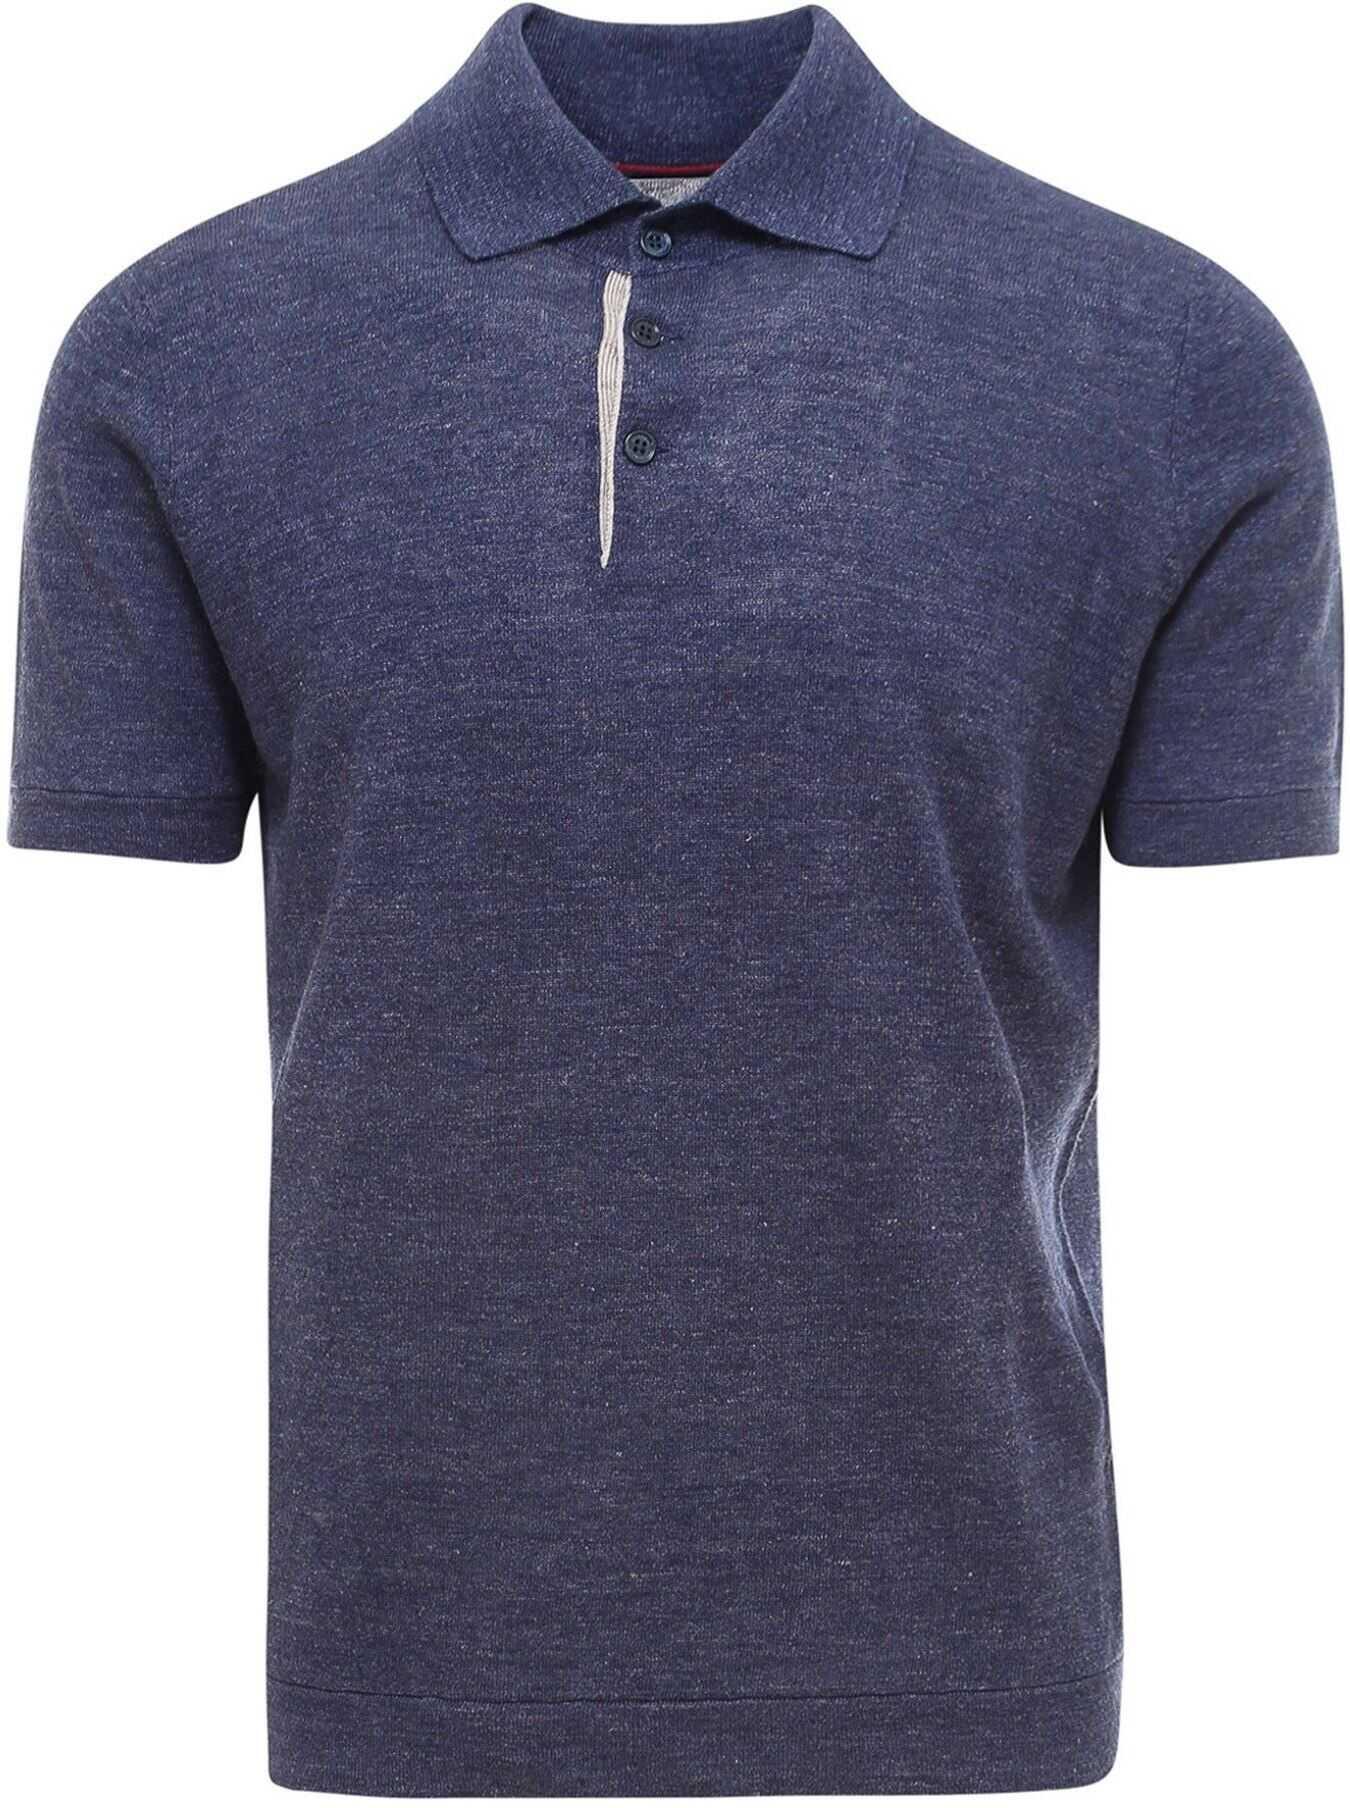 Brunello Cucinelli Linen Cotton Blend Polo Shirt In Blue Blue imagine